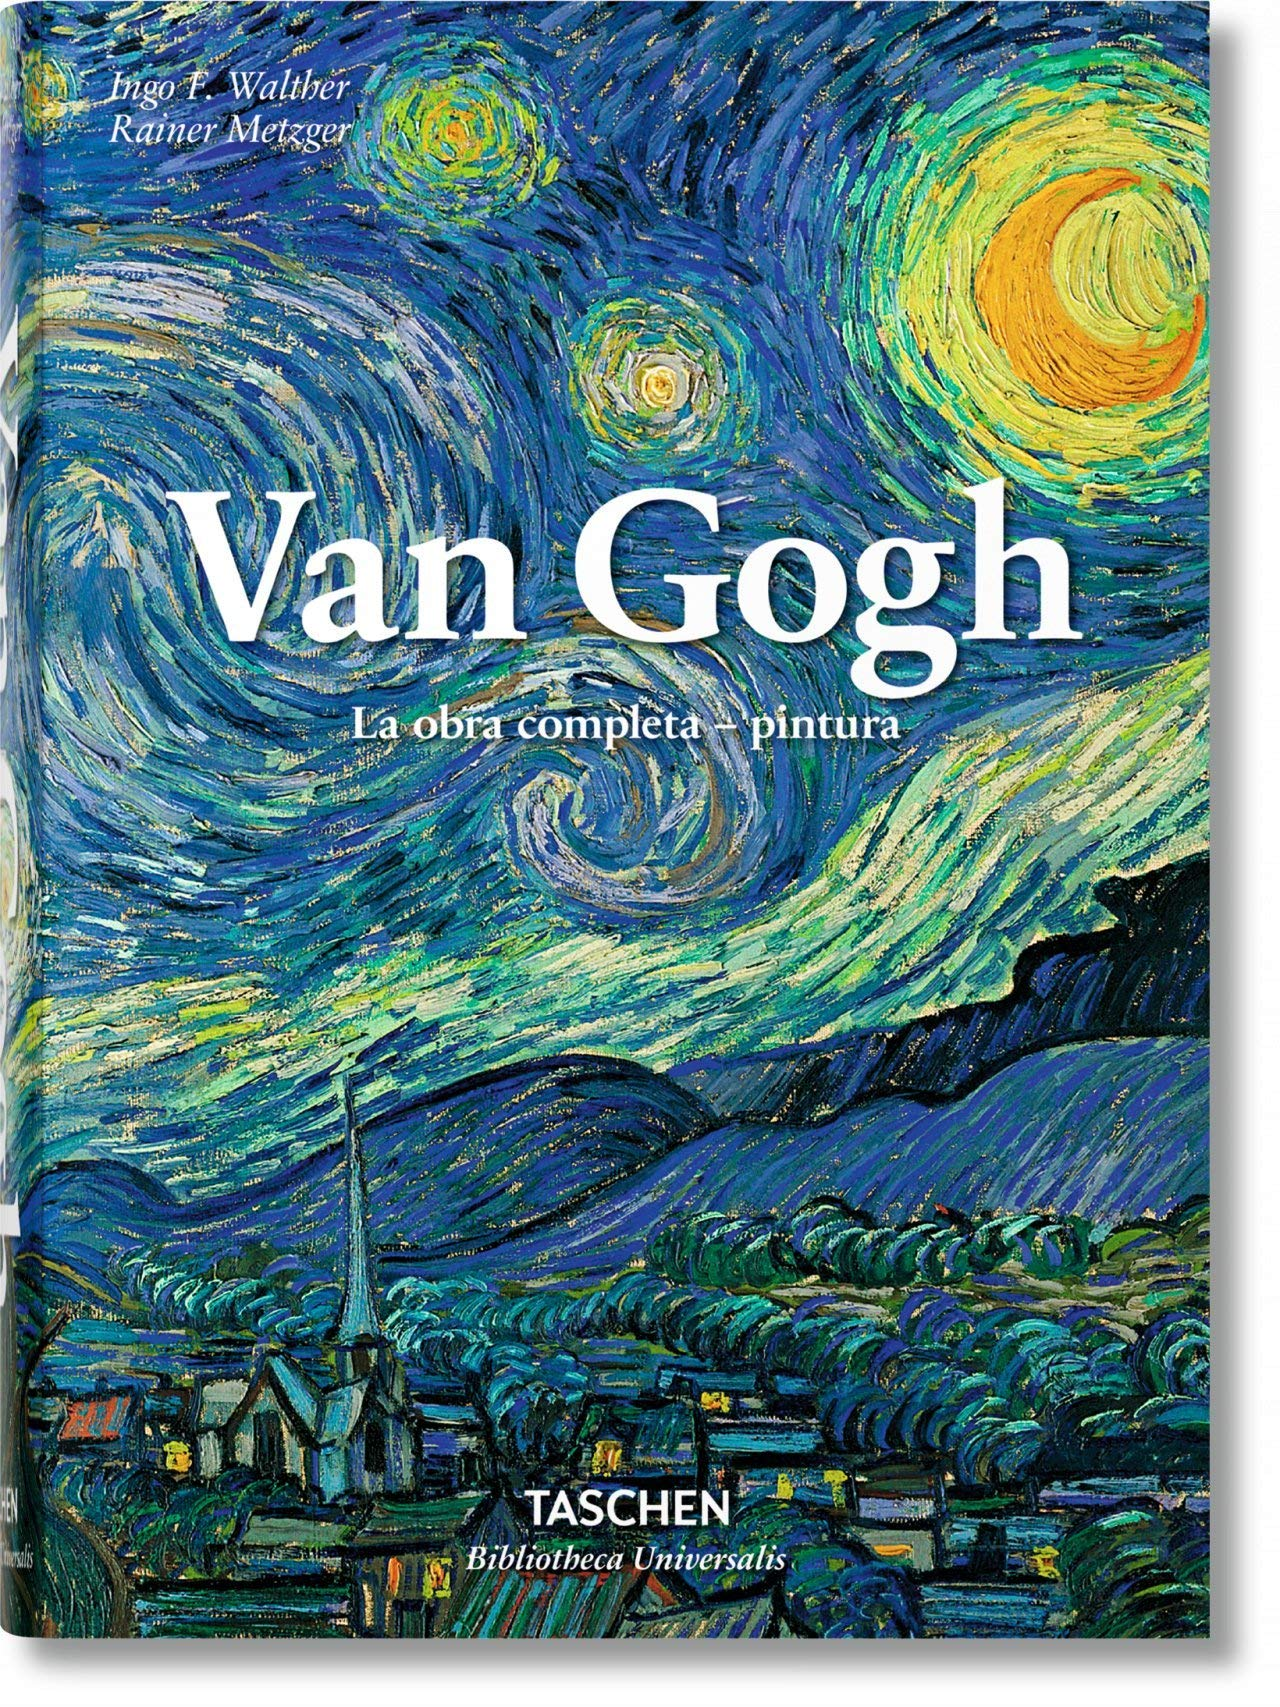 Van Gogh La Obra Completa Pintura Spanish Edition Metzger Rainer Walther Ingo F 9783836557139 Books